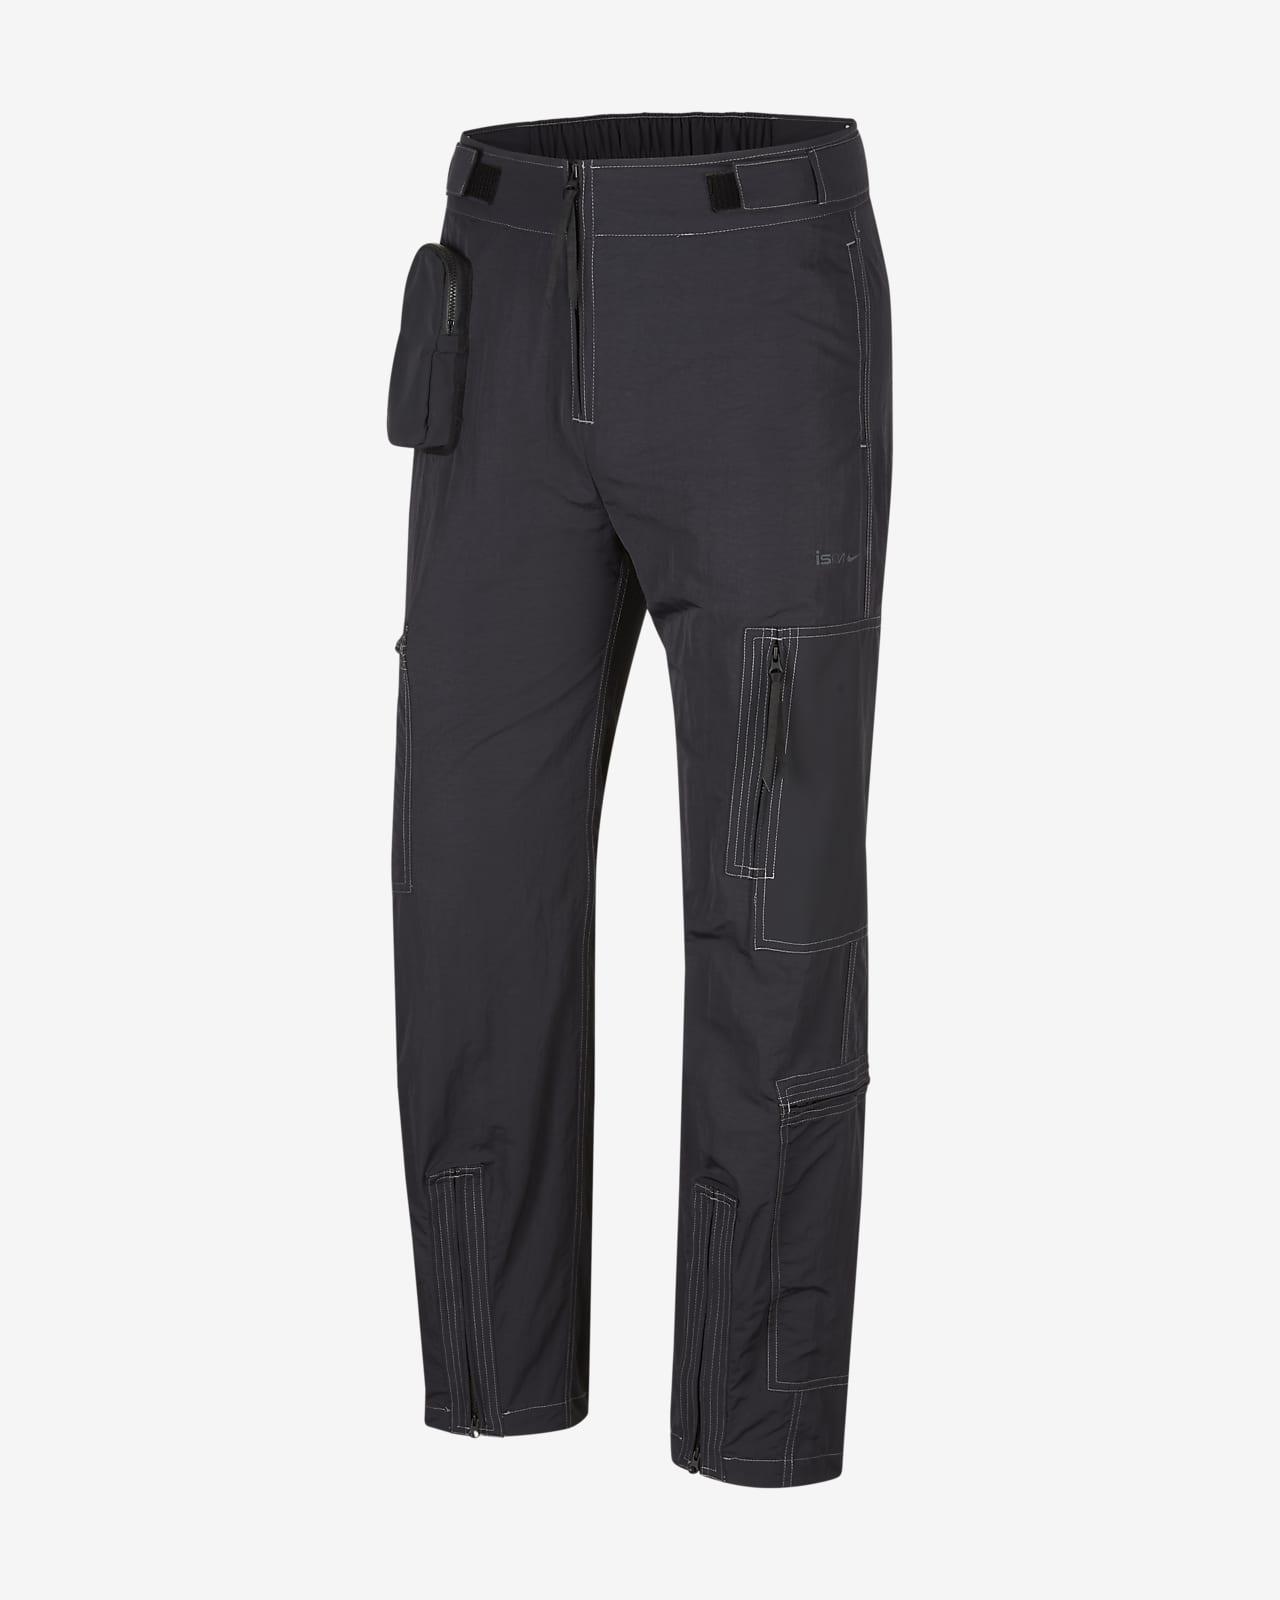 Nike ISPA Women's Trousers